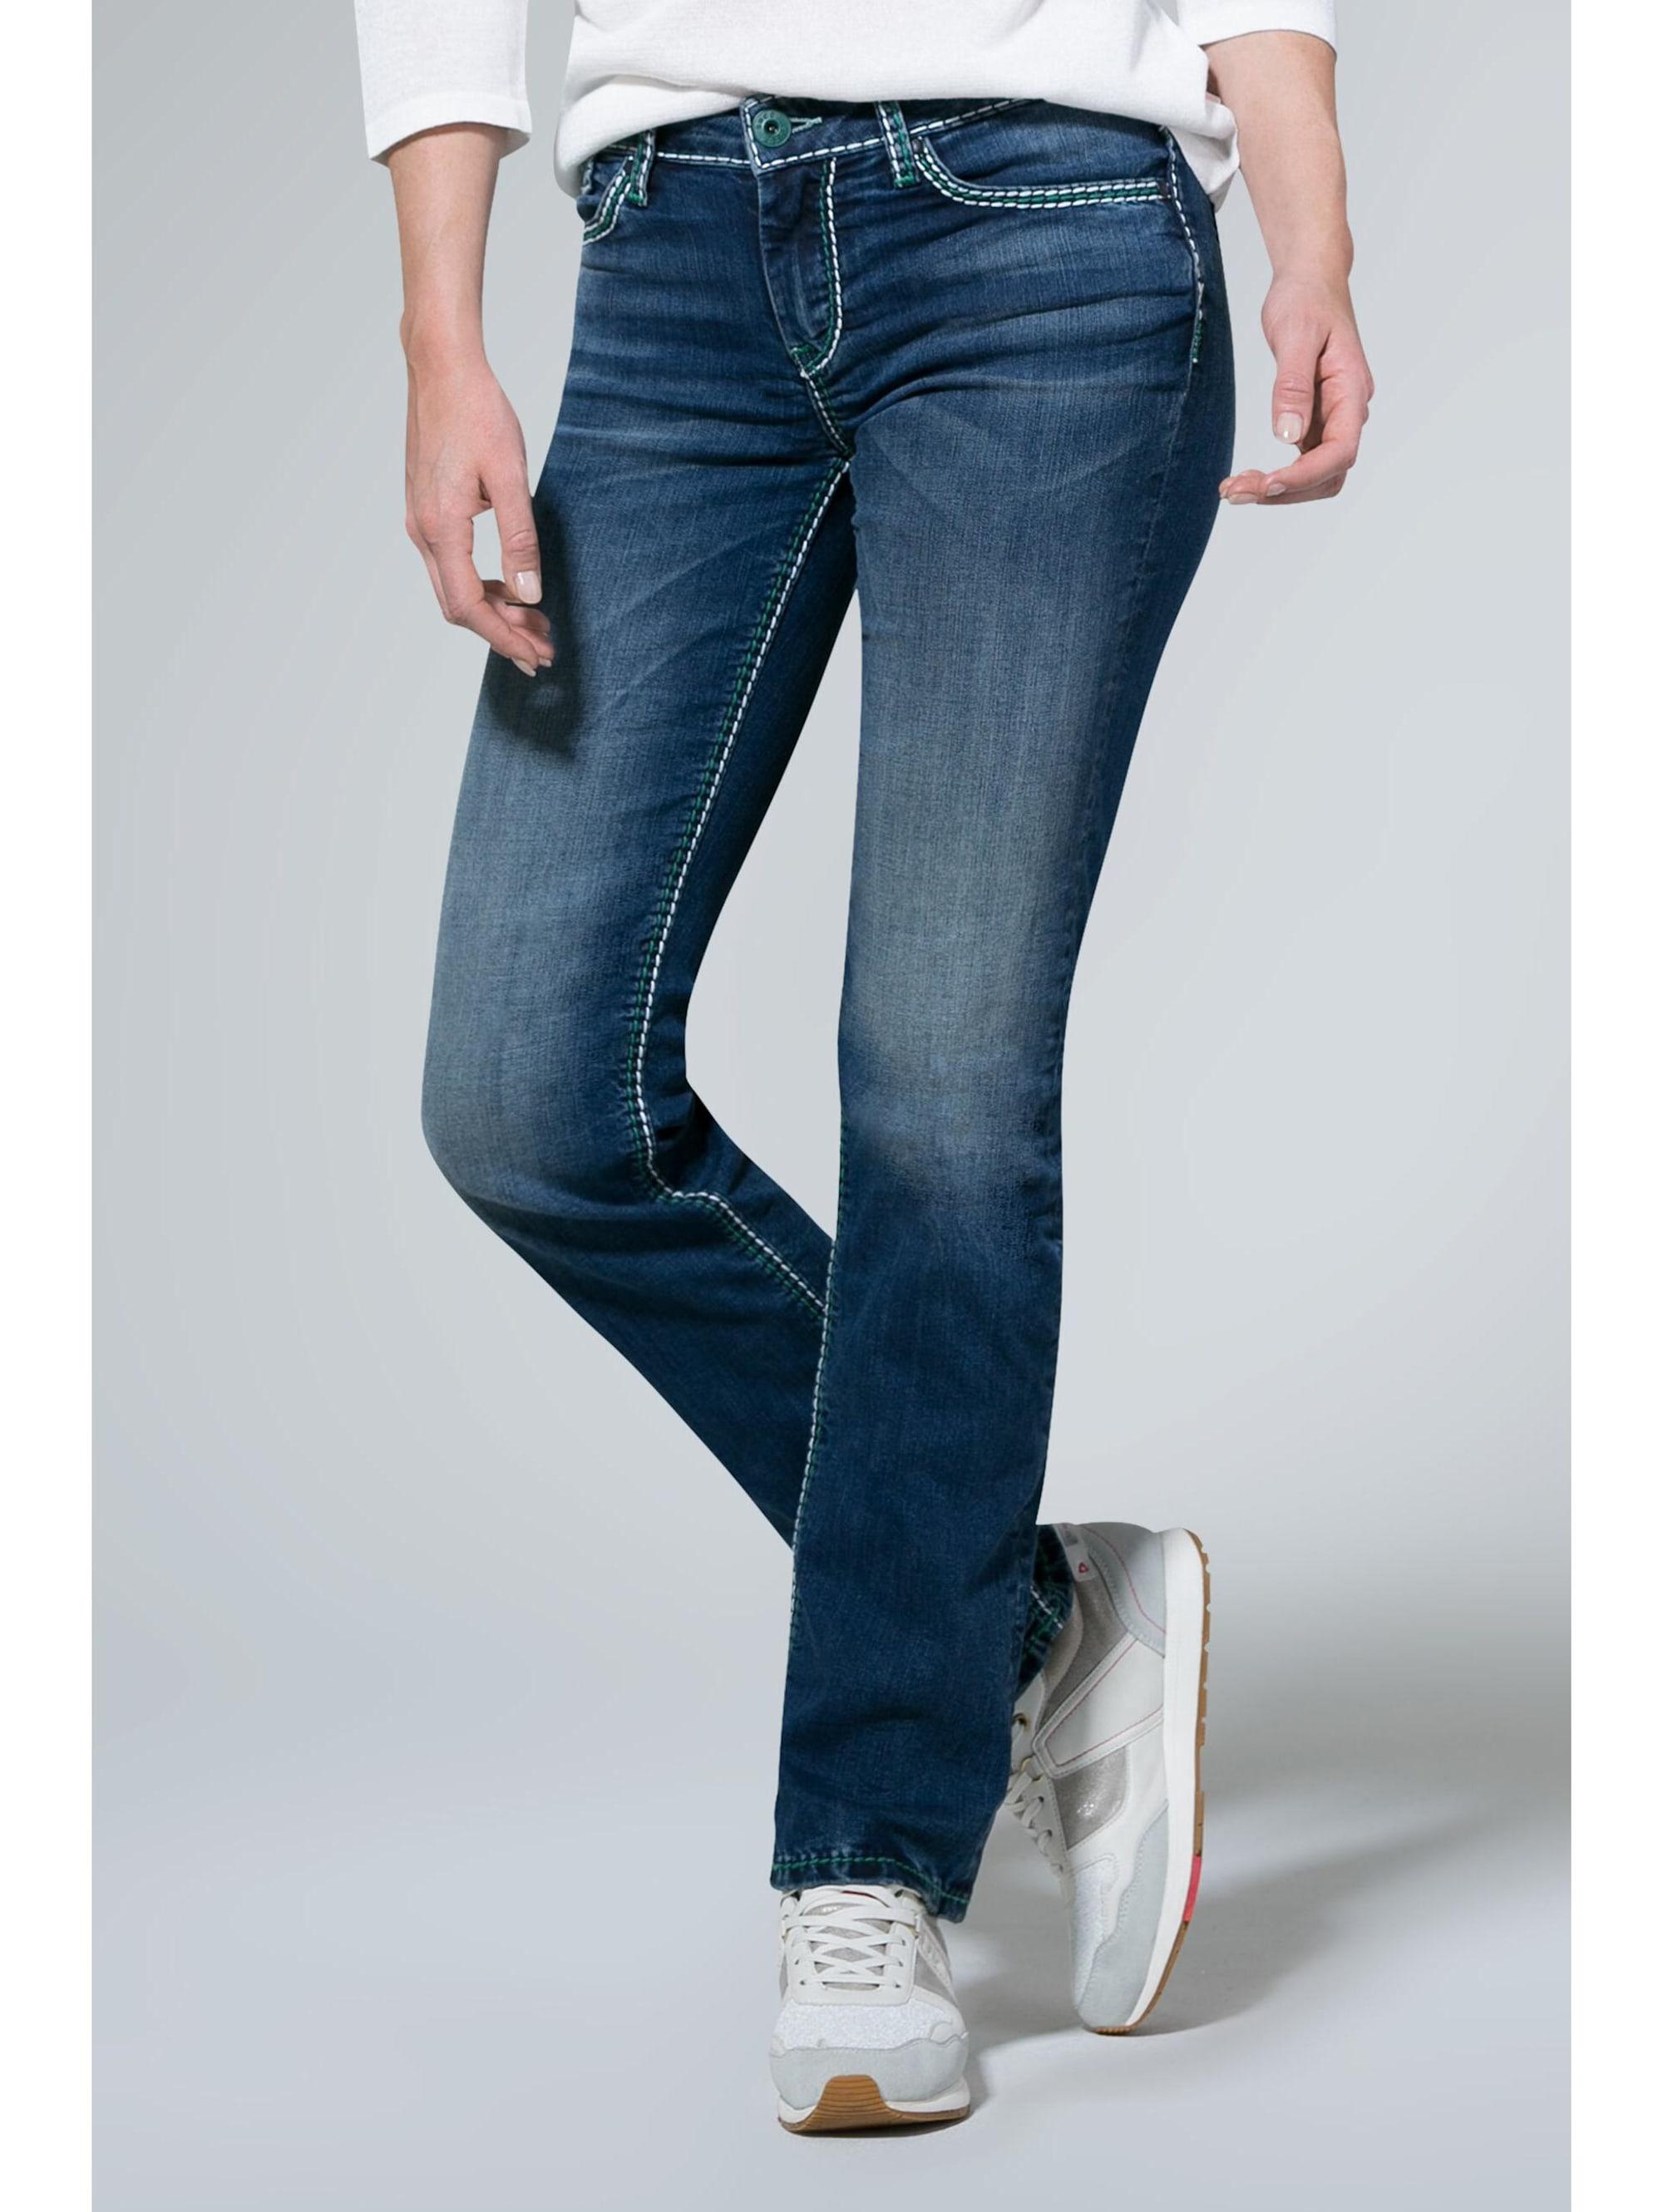 SOCCX Jeans CO:LE mit Kontrastnähten und Boot Cut YTJtj EwCyp